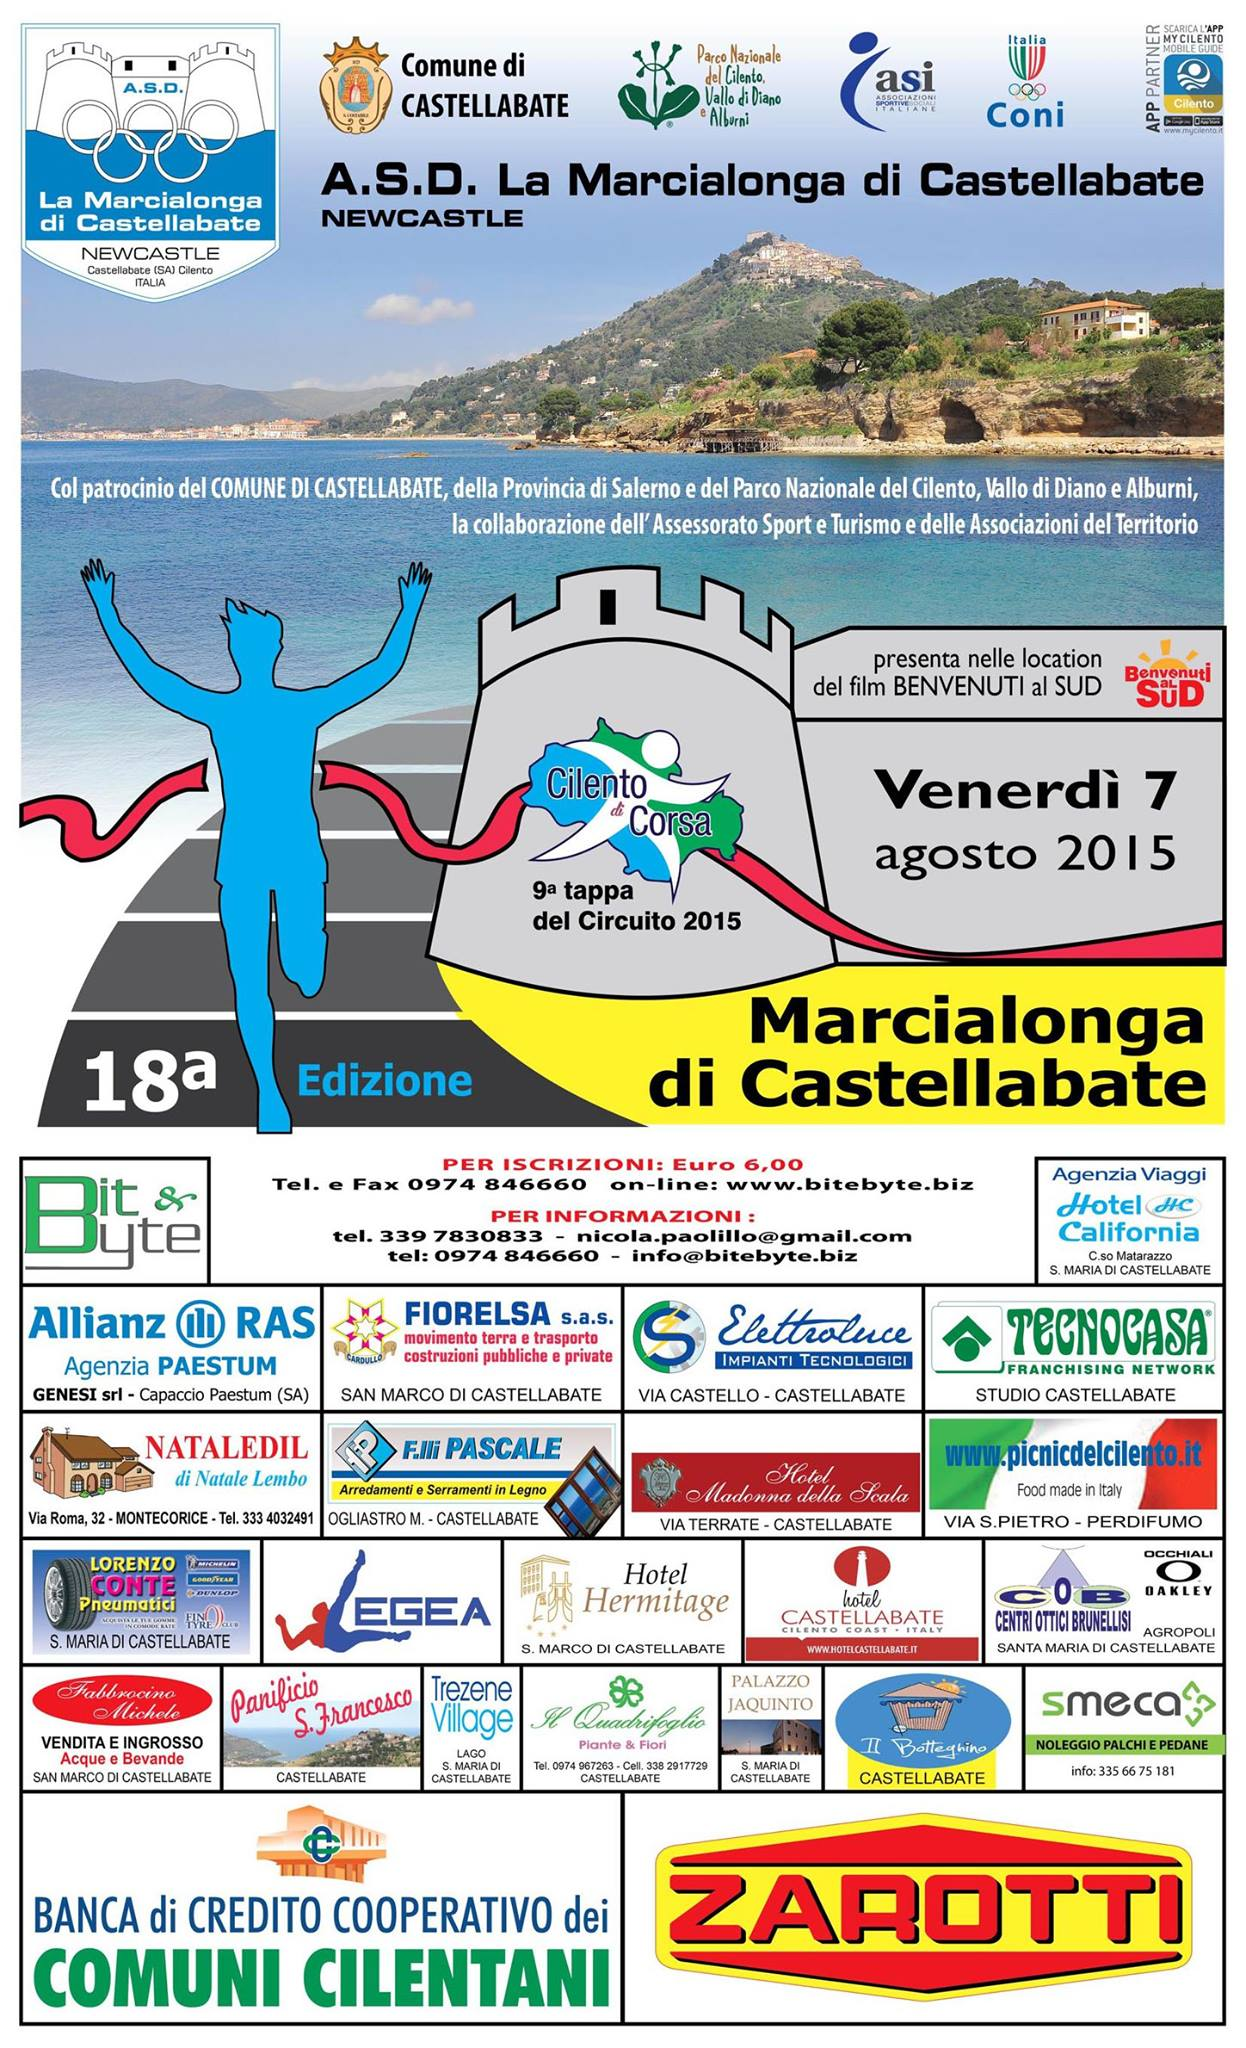 Marcialonga di Castellabate 2015